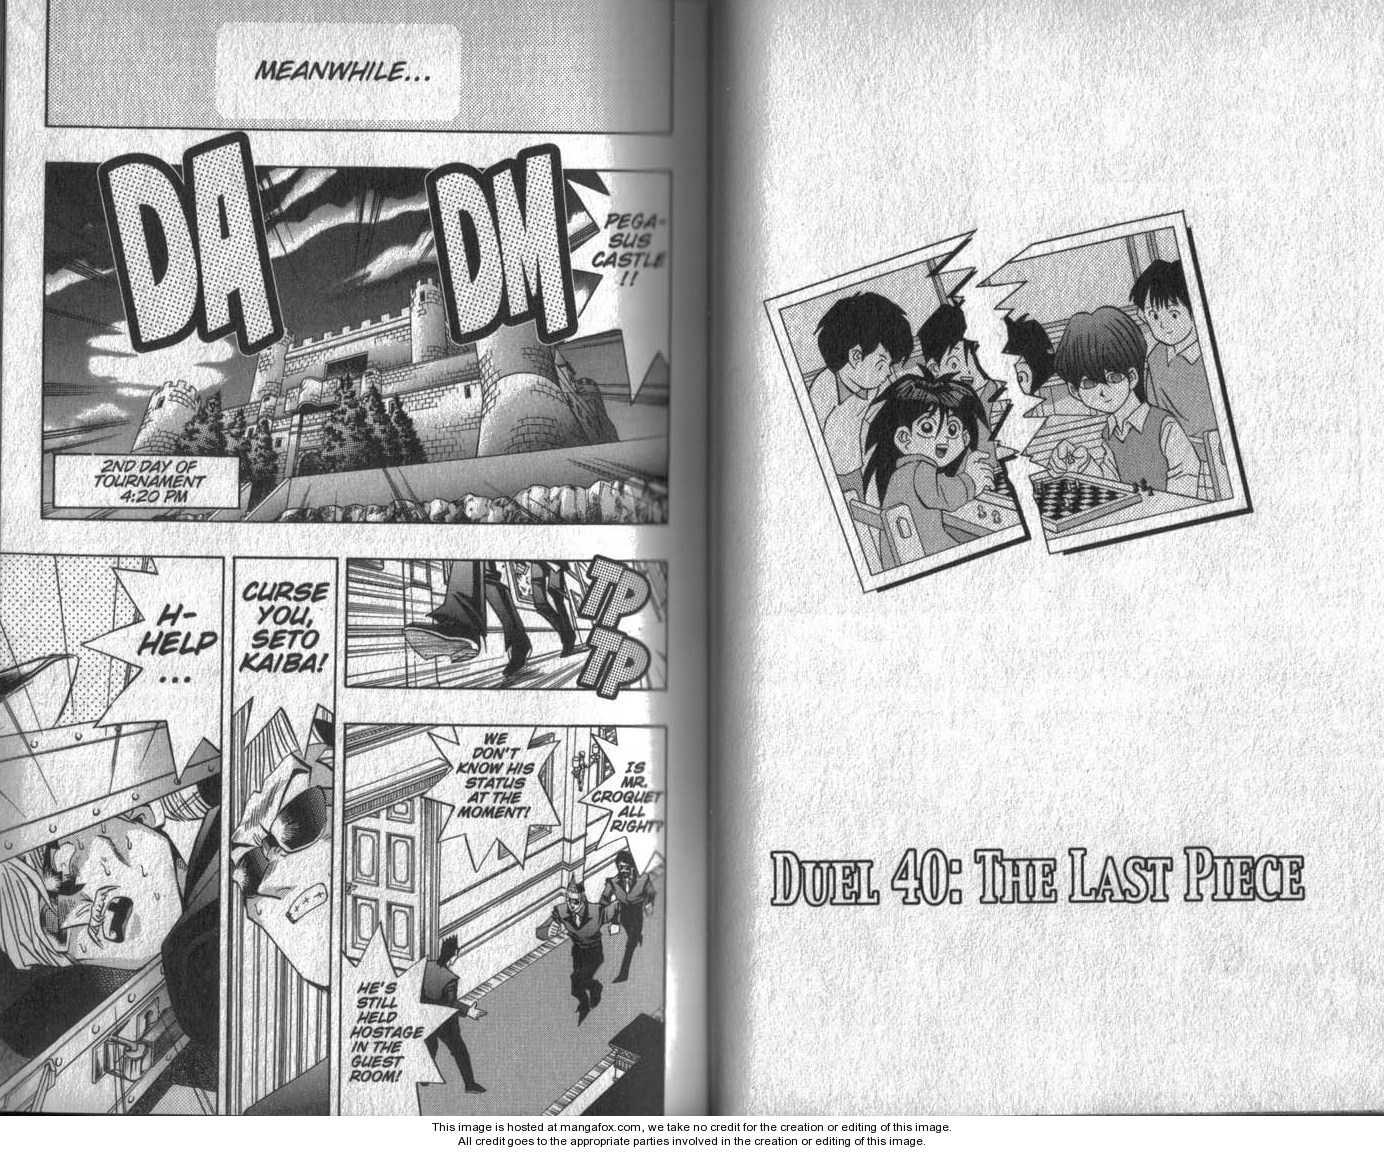 Yu-Gi-Oh! Duelist 40 Page 3